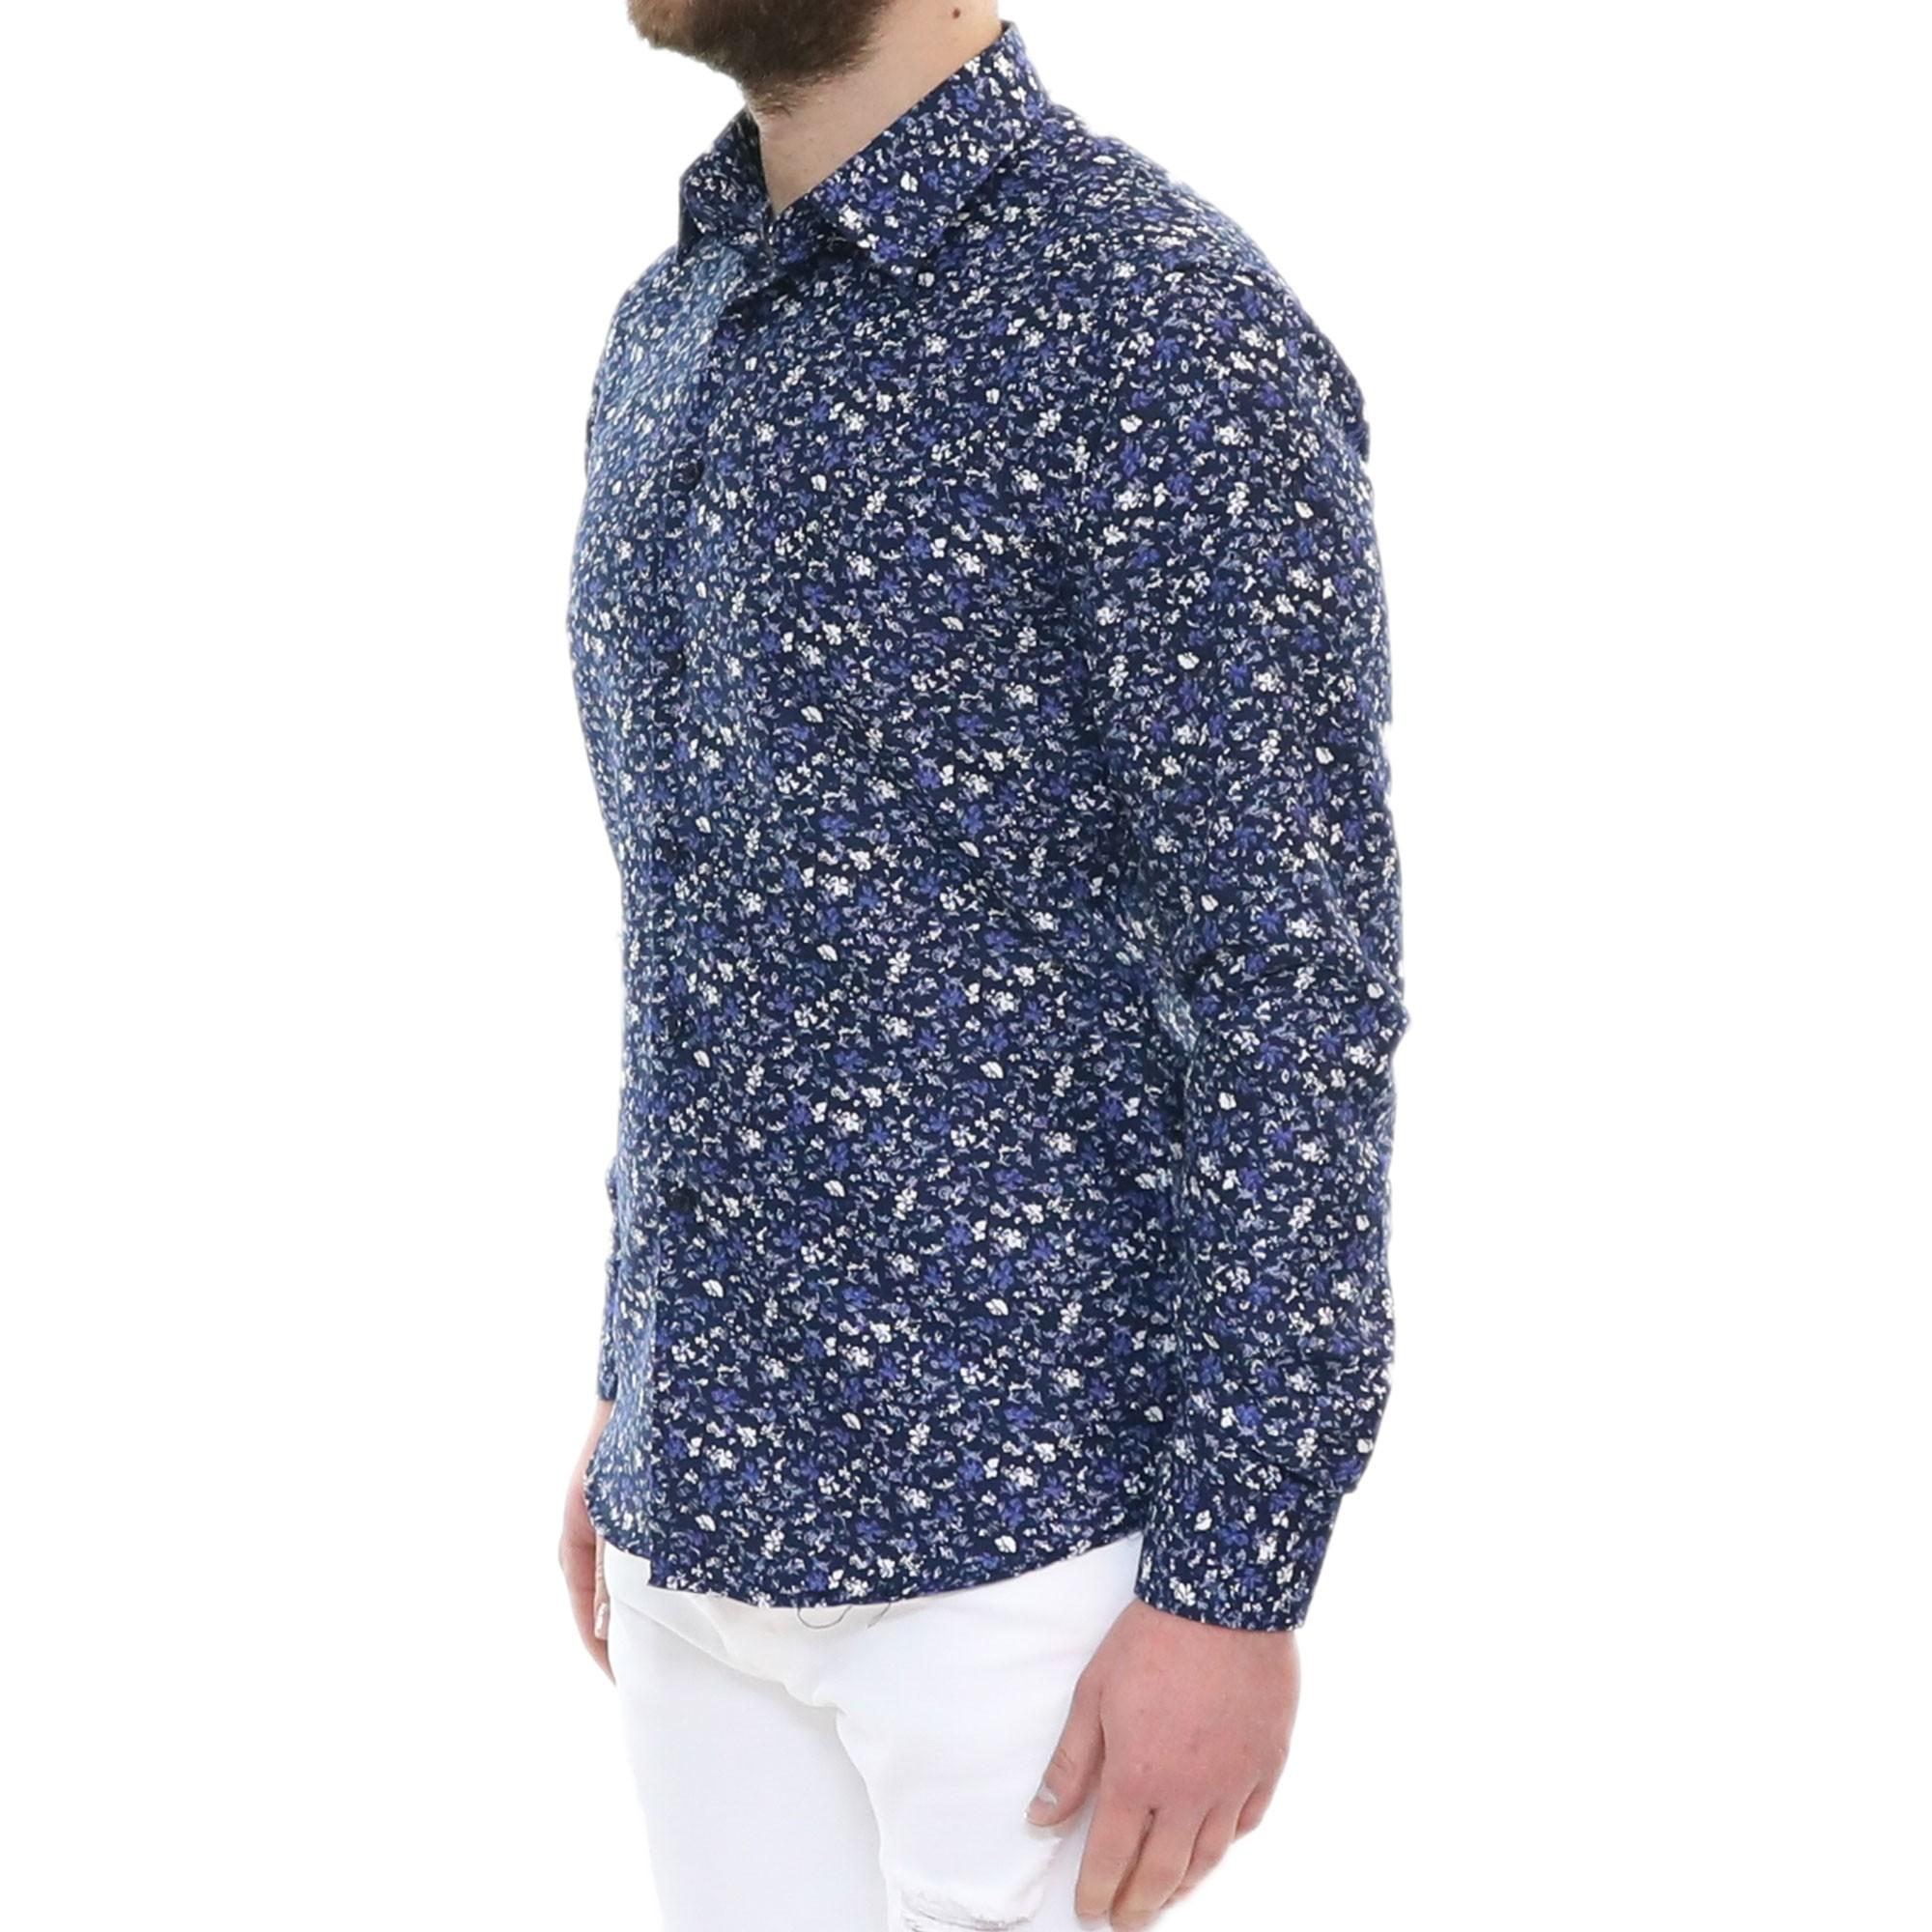 Camicia-Uomo-Cotone-Fiori-Slim-Manica-Lunga-Fantasia-Floreale-S-M-L-XL-XXL miniatura 13